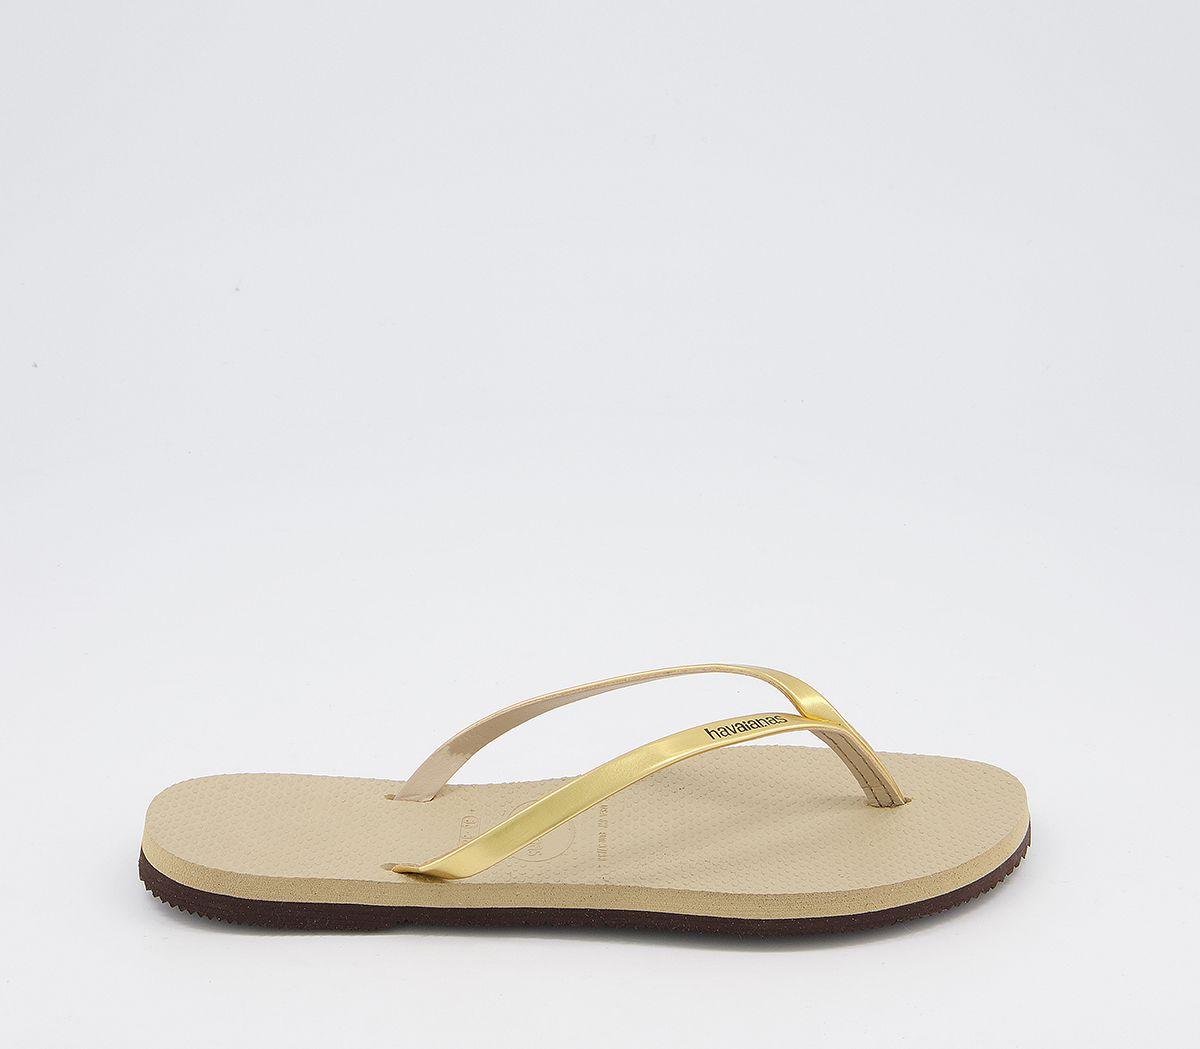 bb62bf167399 Havaianas Slim You Metallic Flip Flop Sand Grey Light Gold - Sandals